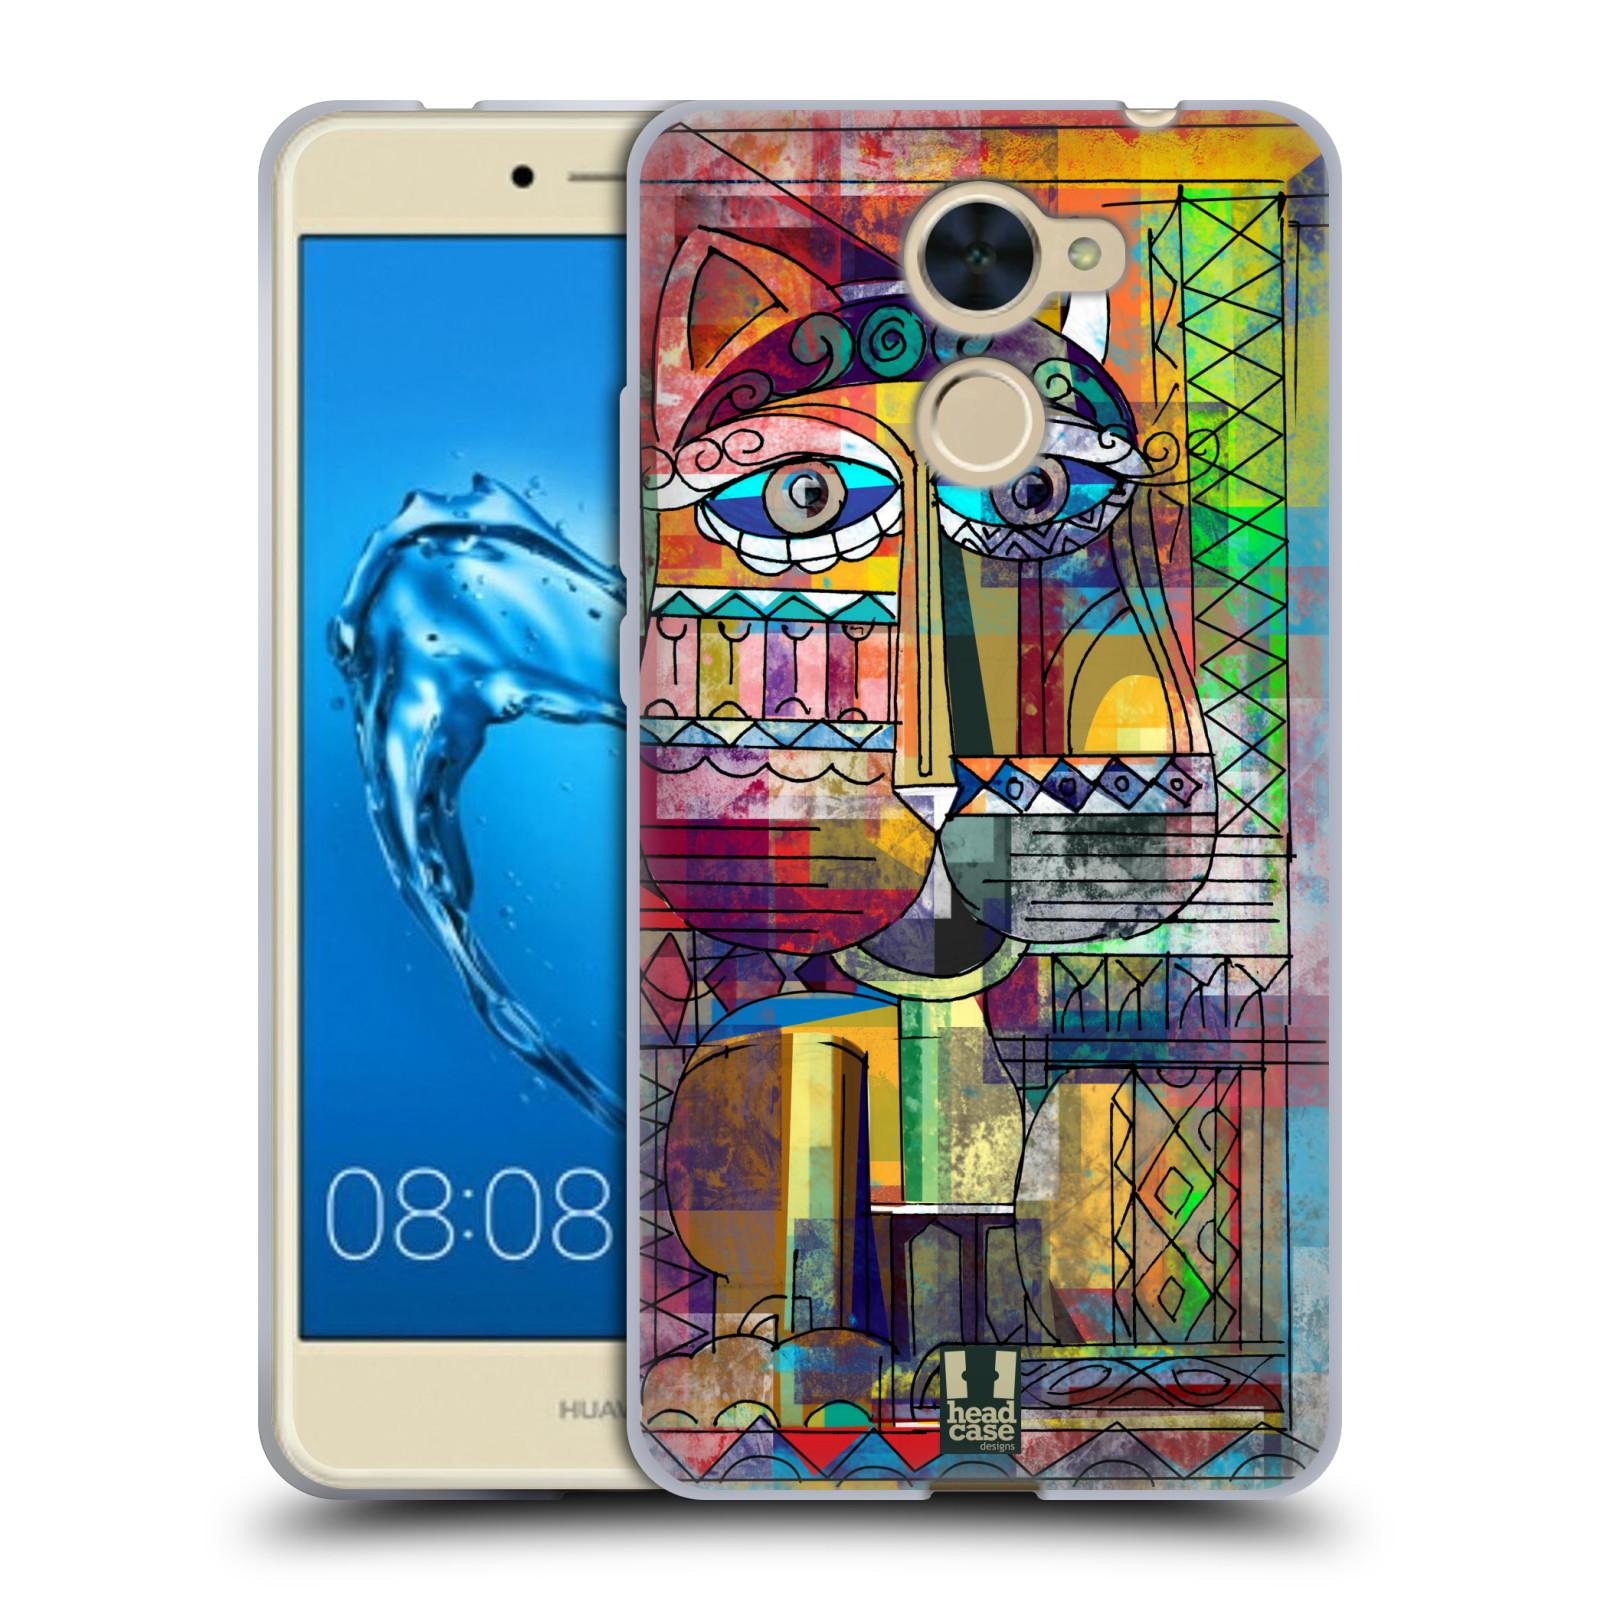 Silikonové pouzdro na mobil Huawei Y7 - Head Case - AZTEC KORAT